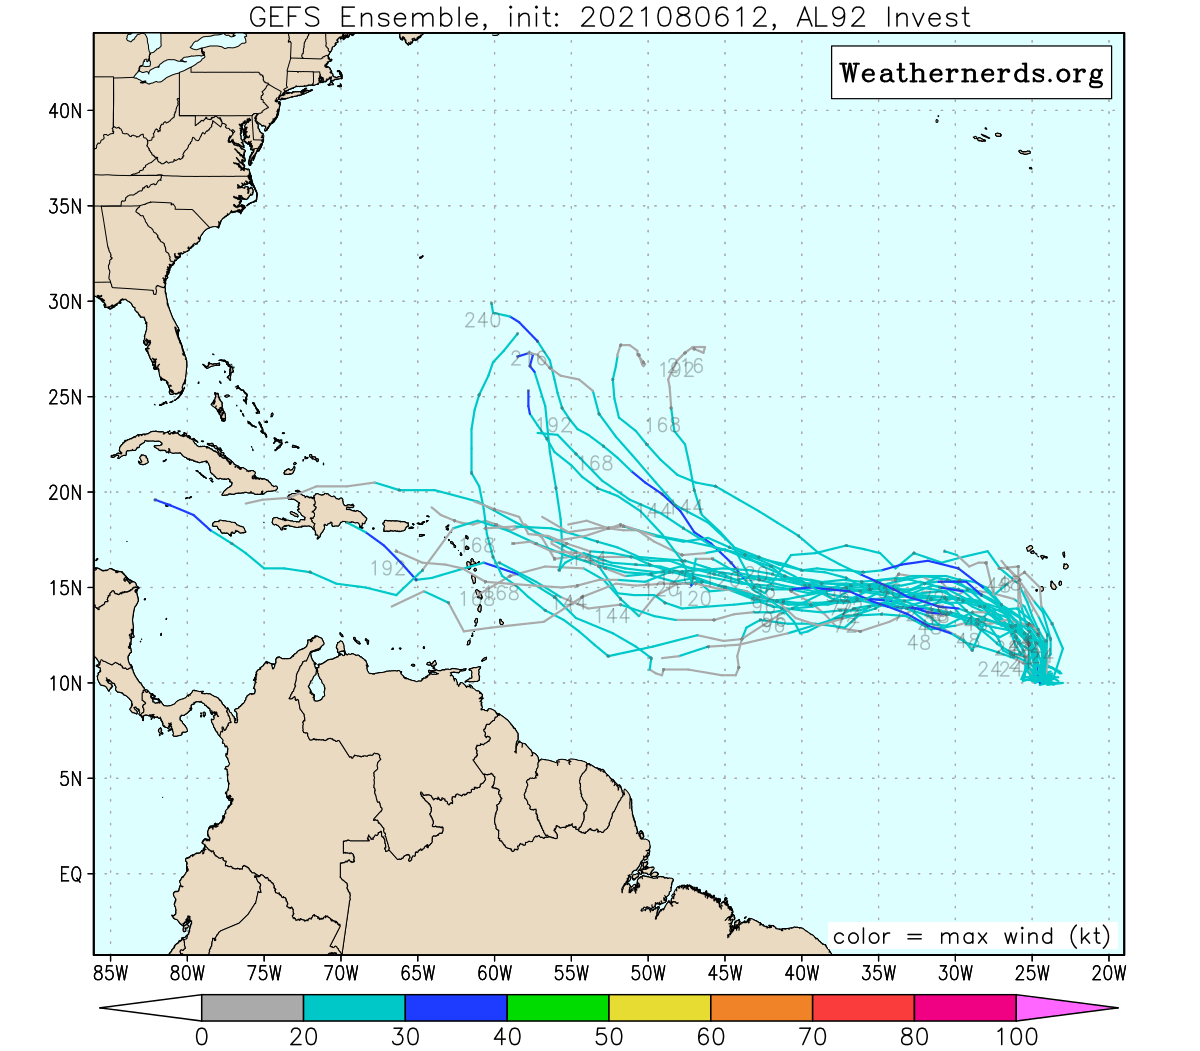 atlantic-hurricane-season-forecast-mjo-wave-storm-fred-tropical-wave-track